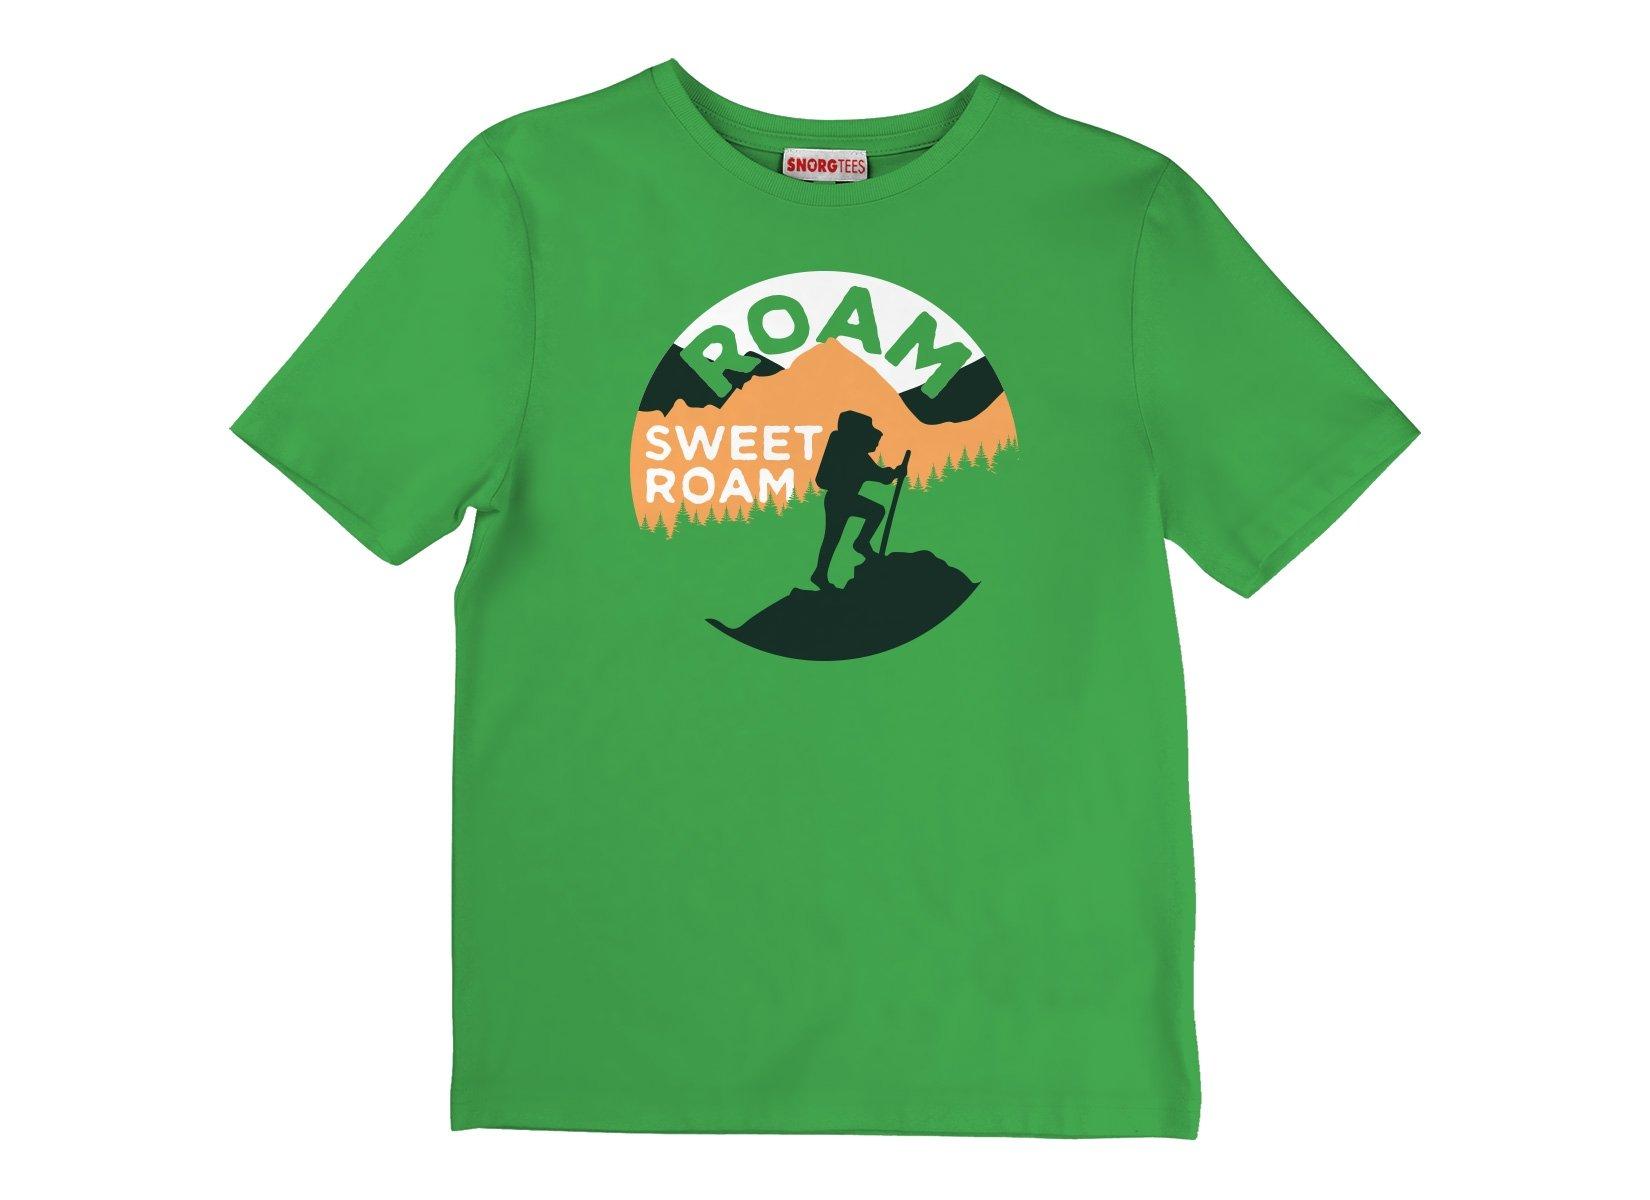 Roam Sweet Roam on Kids T-Shirt